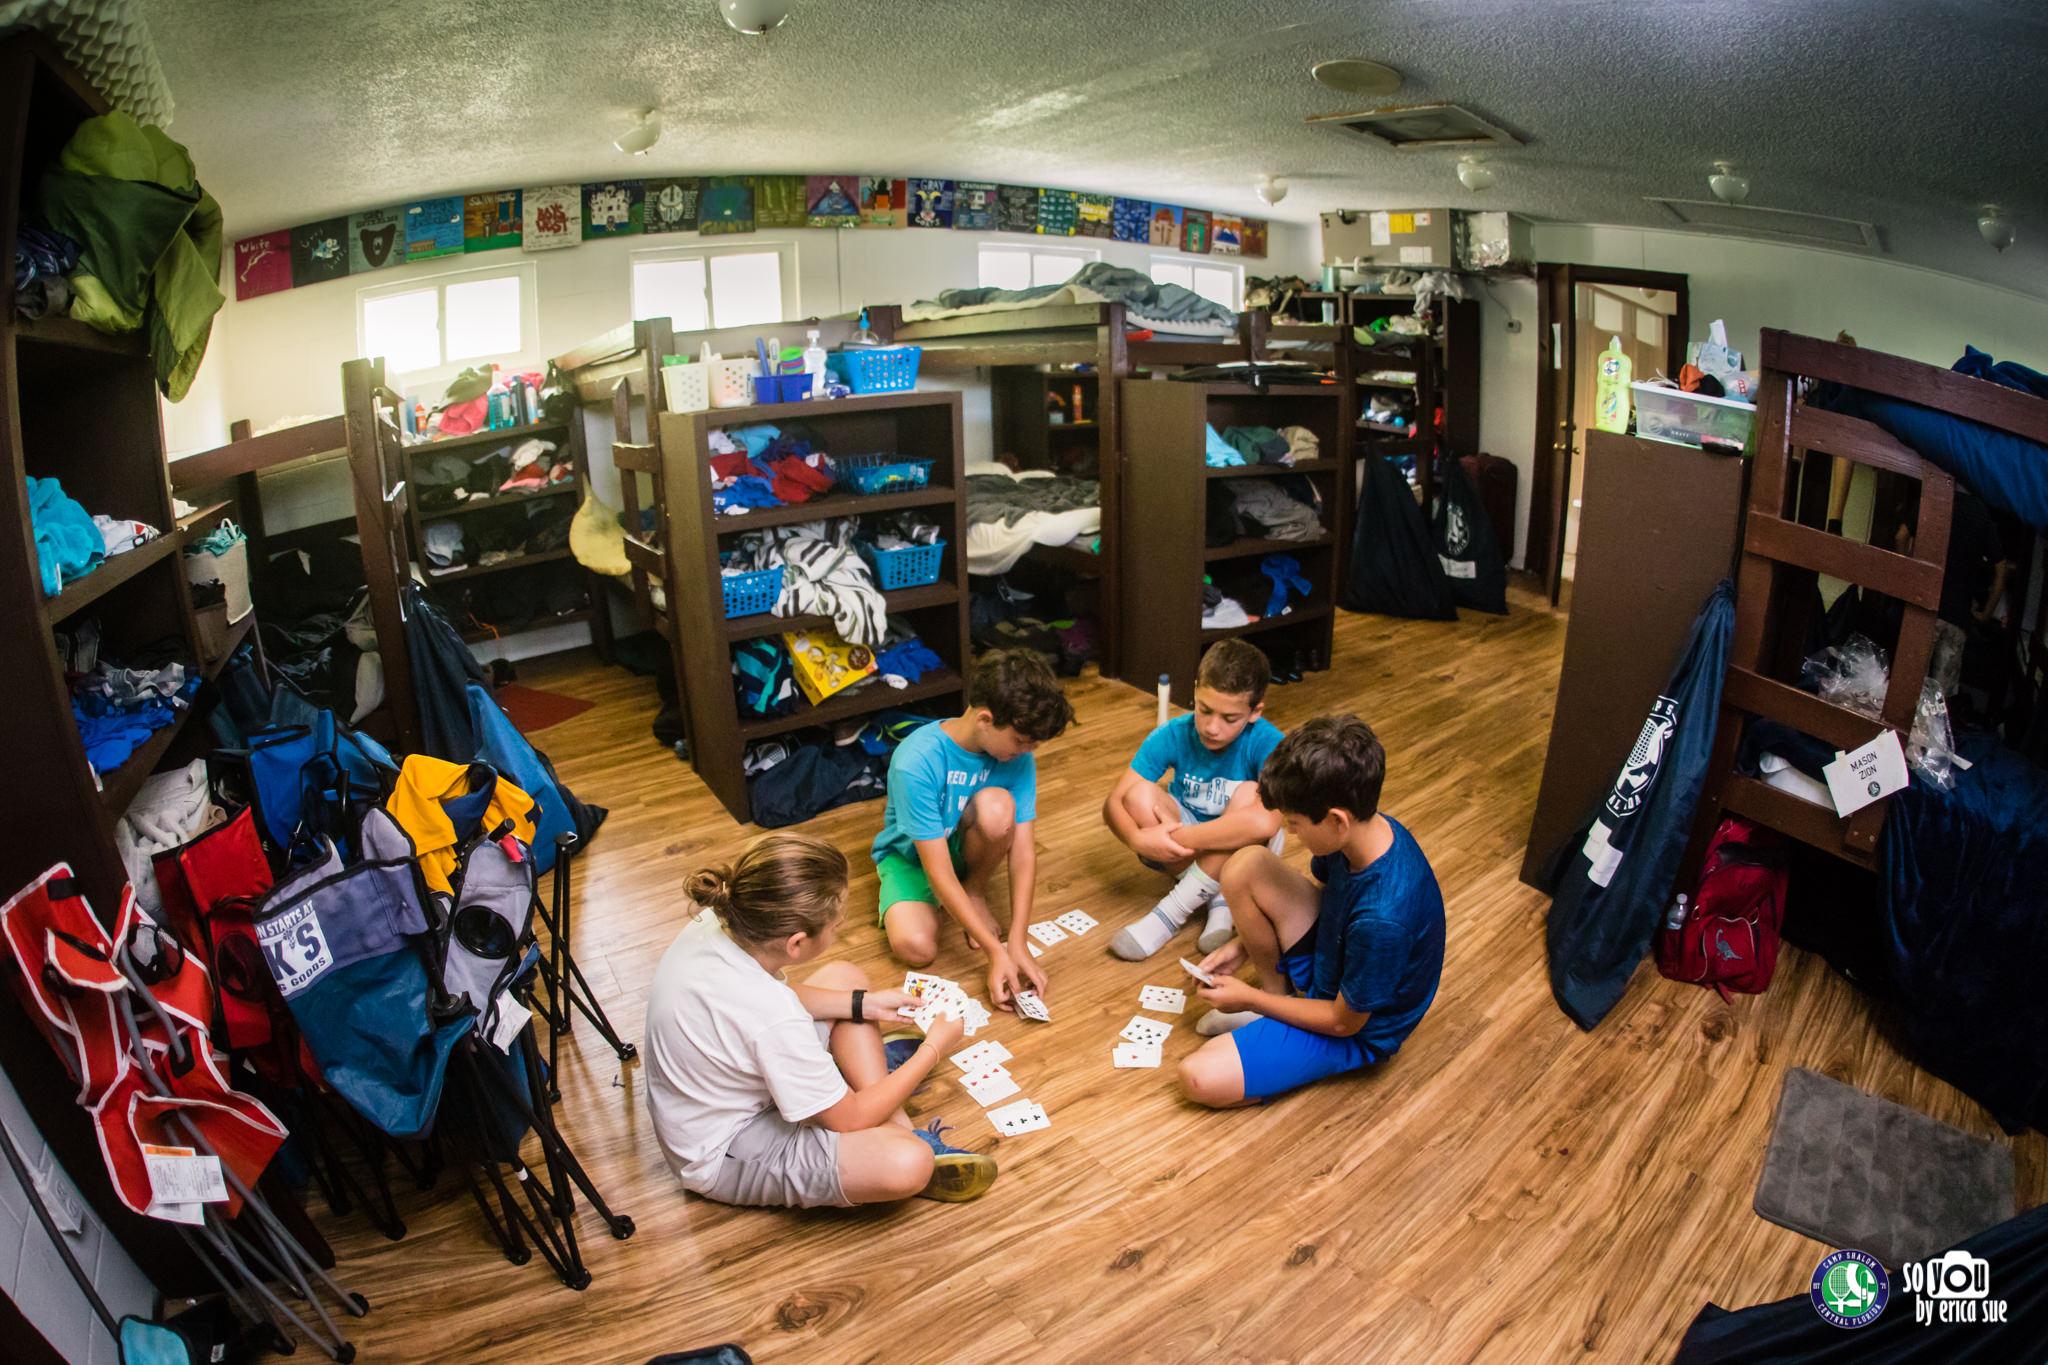 so-you-by-erica-sue-camp-shalom-central-florida-sleepaway-camp-4791.jpg